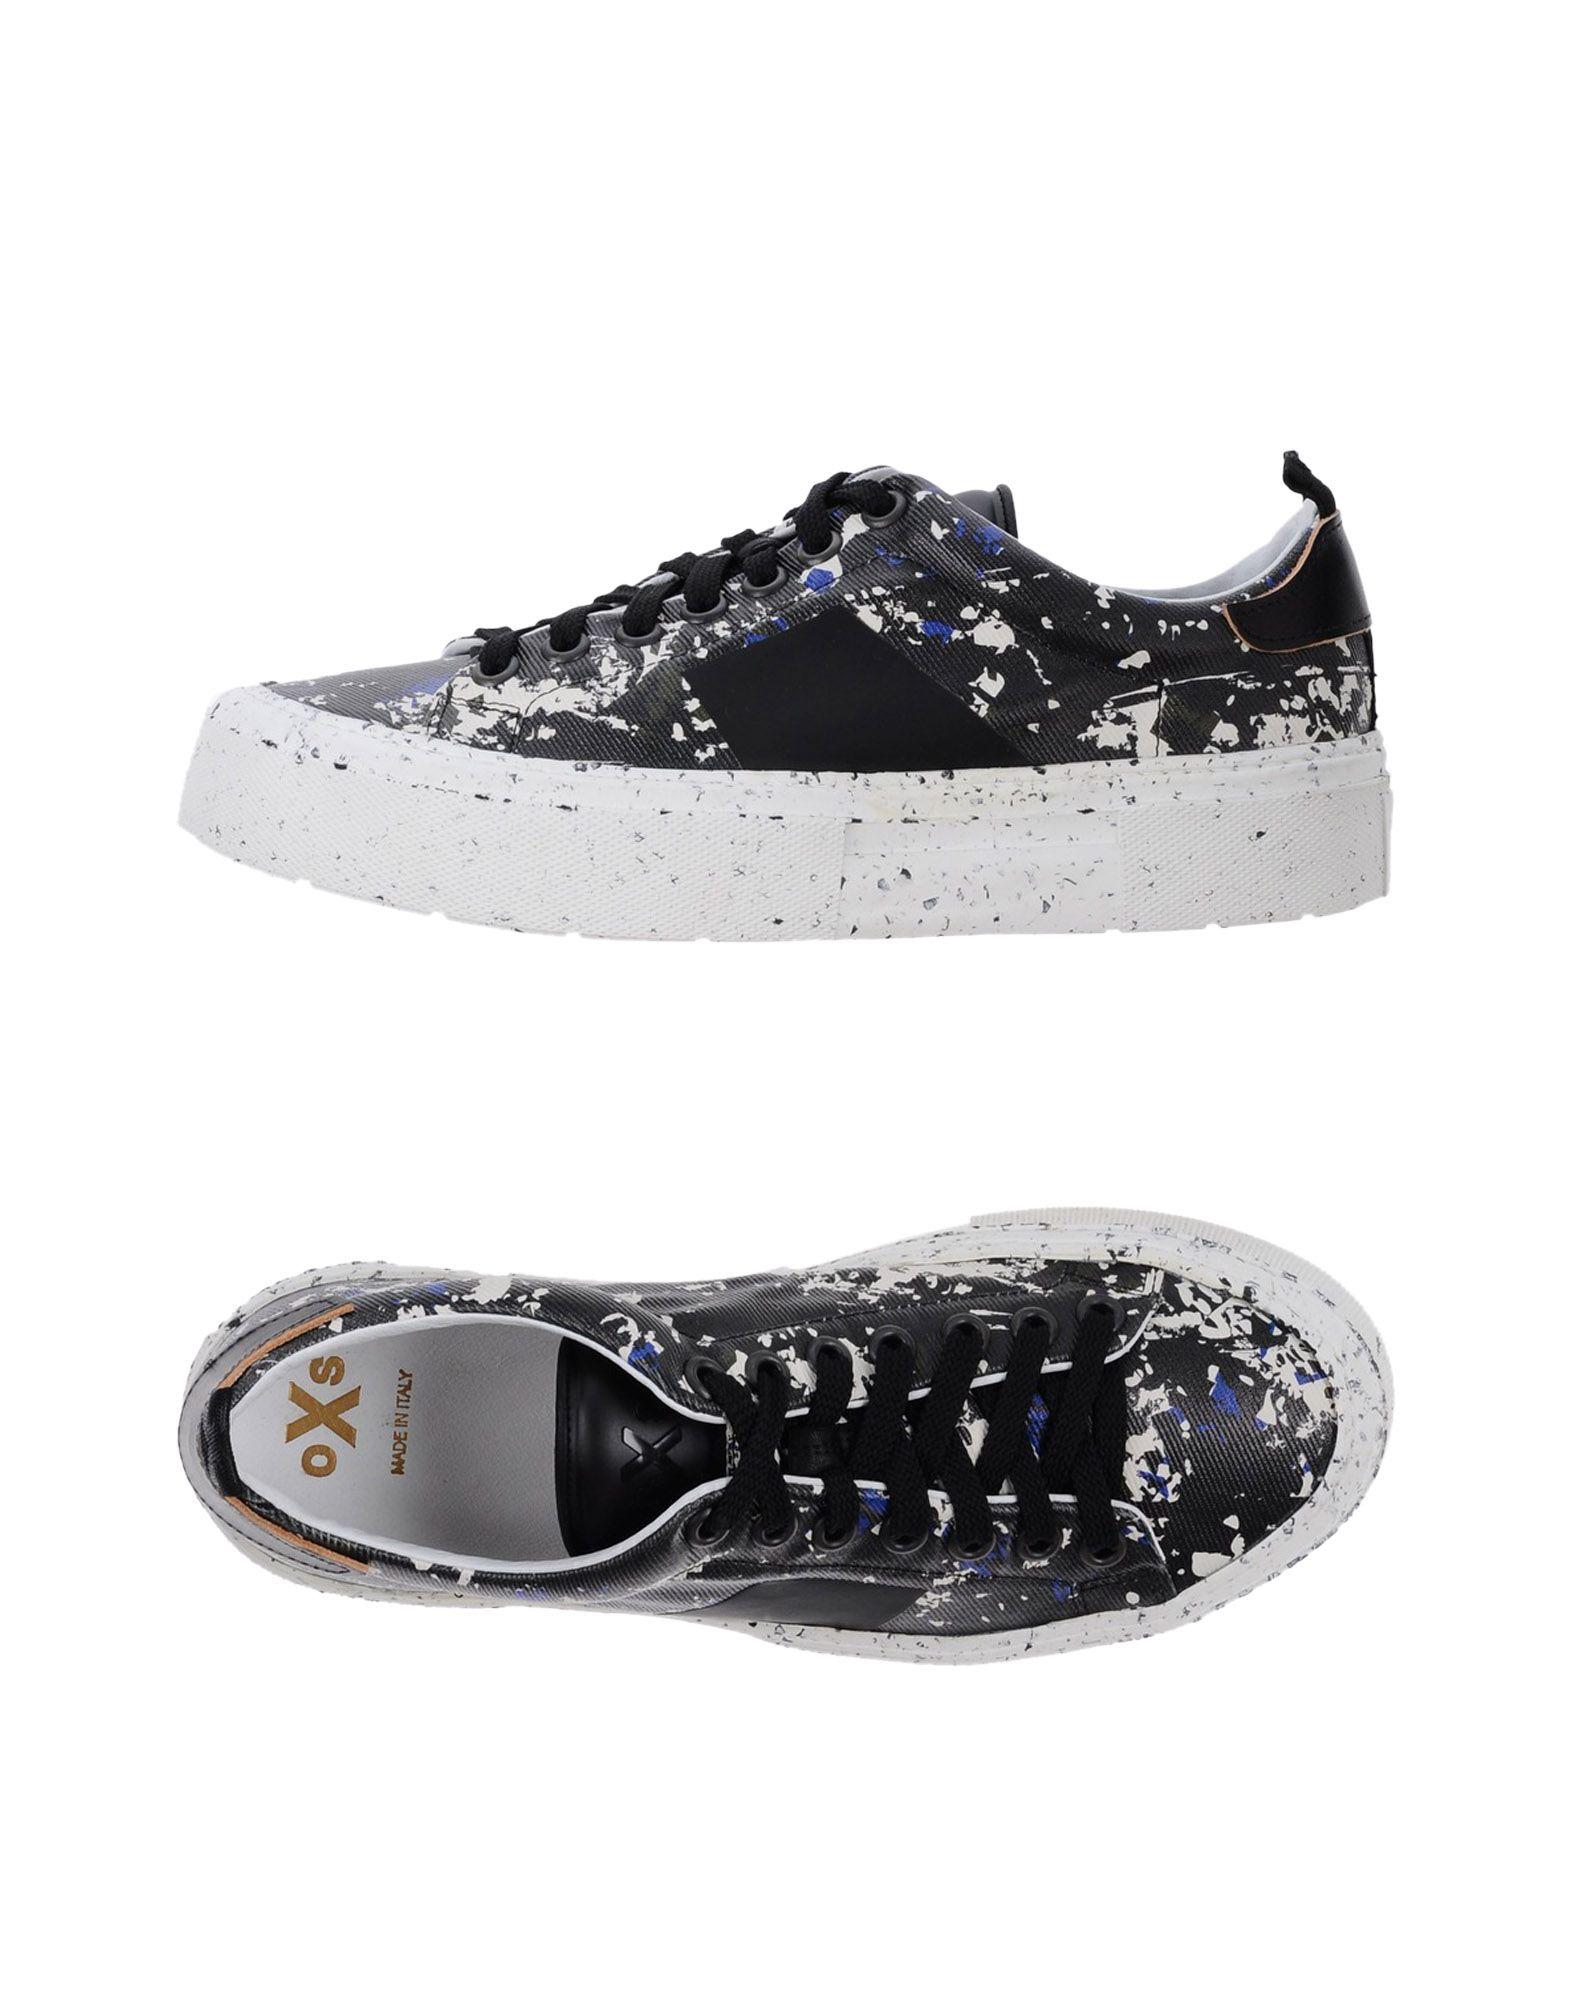 O.X.S. Heiße Sneakers Herren  11355087CO Heiße O.X.S. Schuhe d098cc